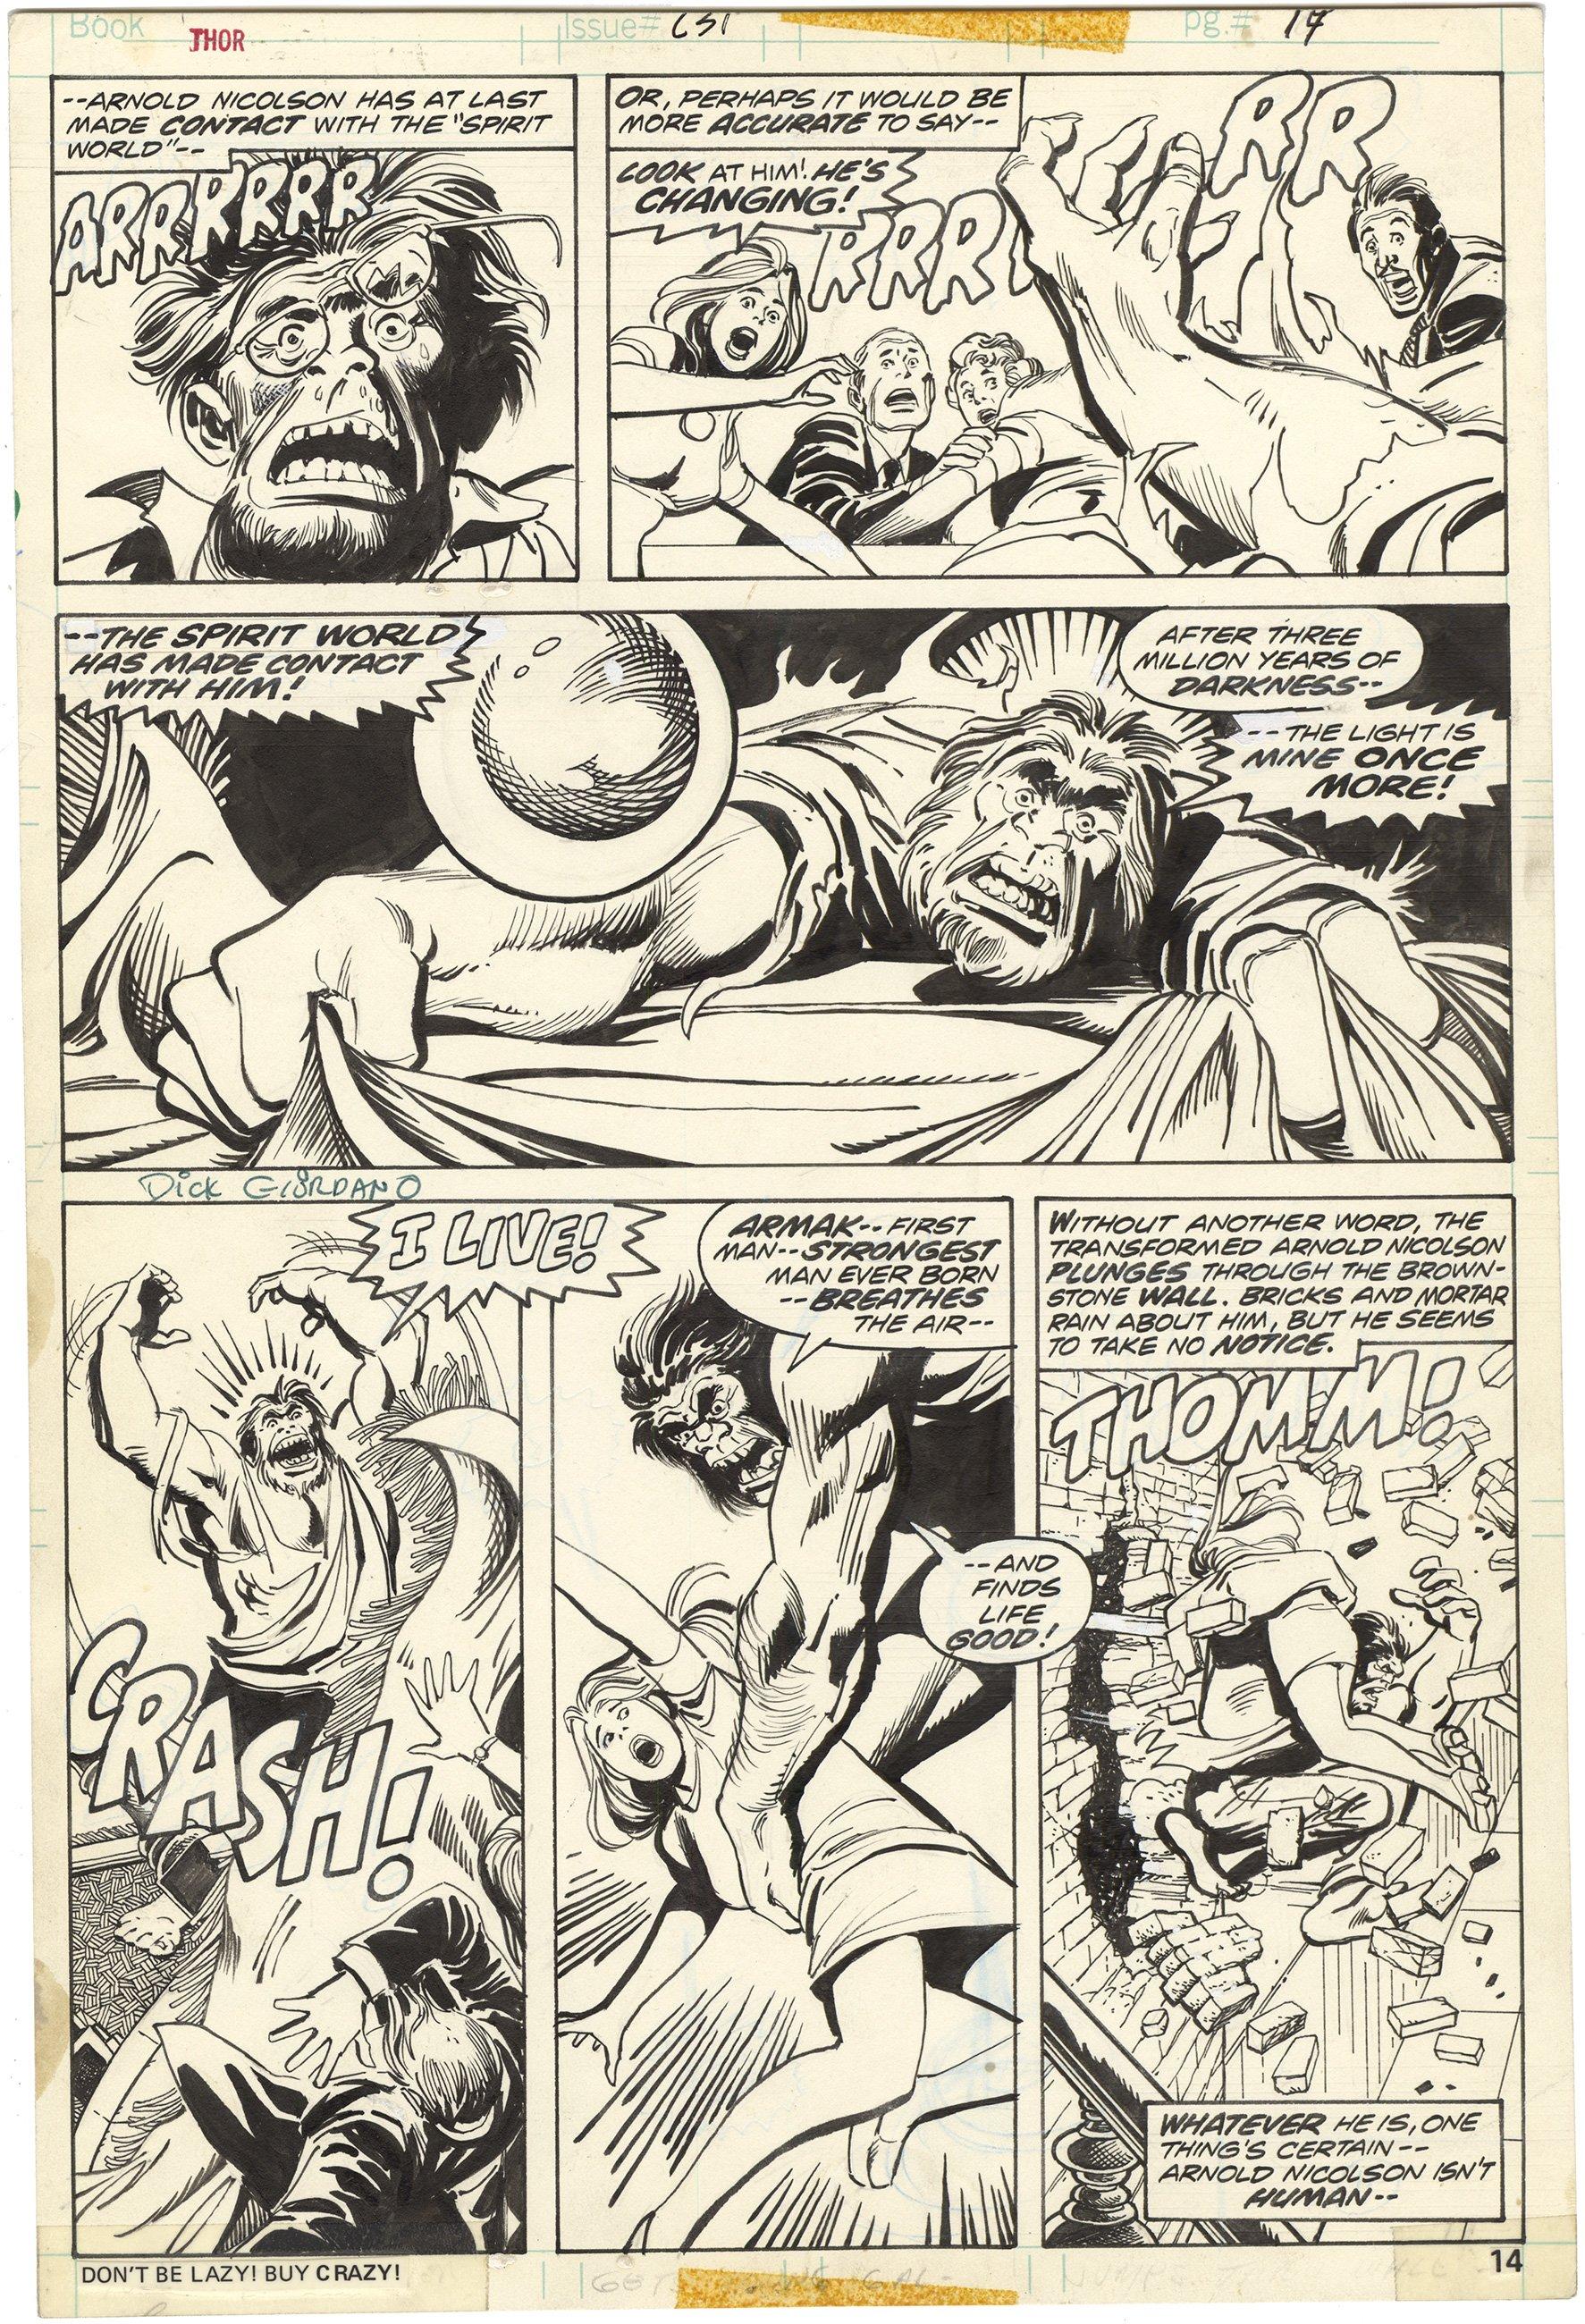 Thor #231 p14 (Signed)